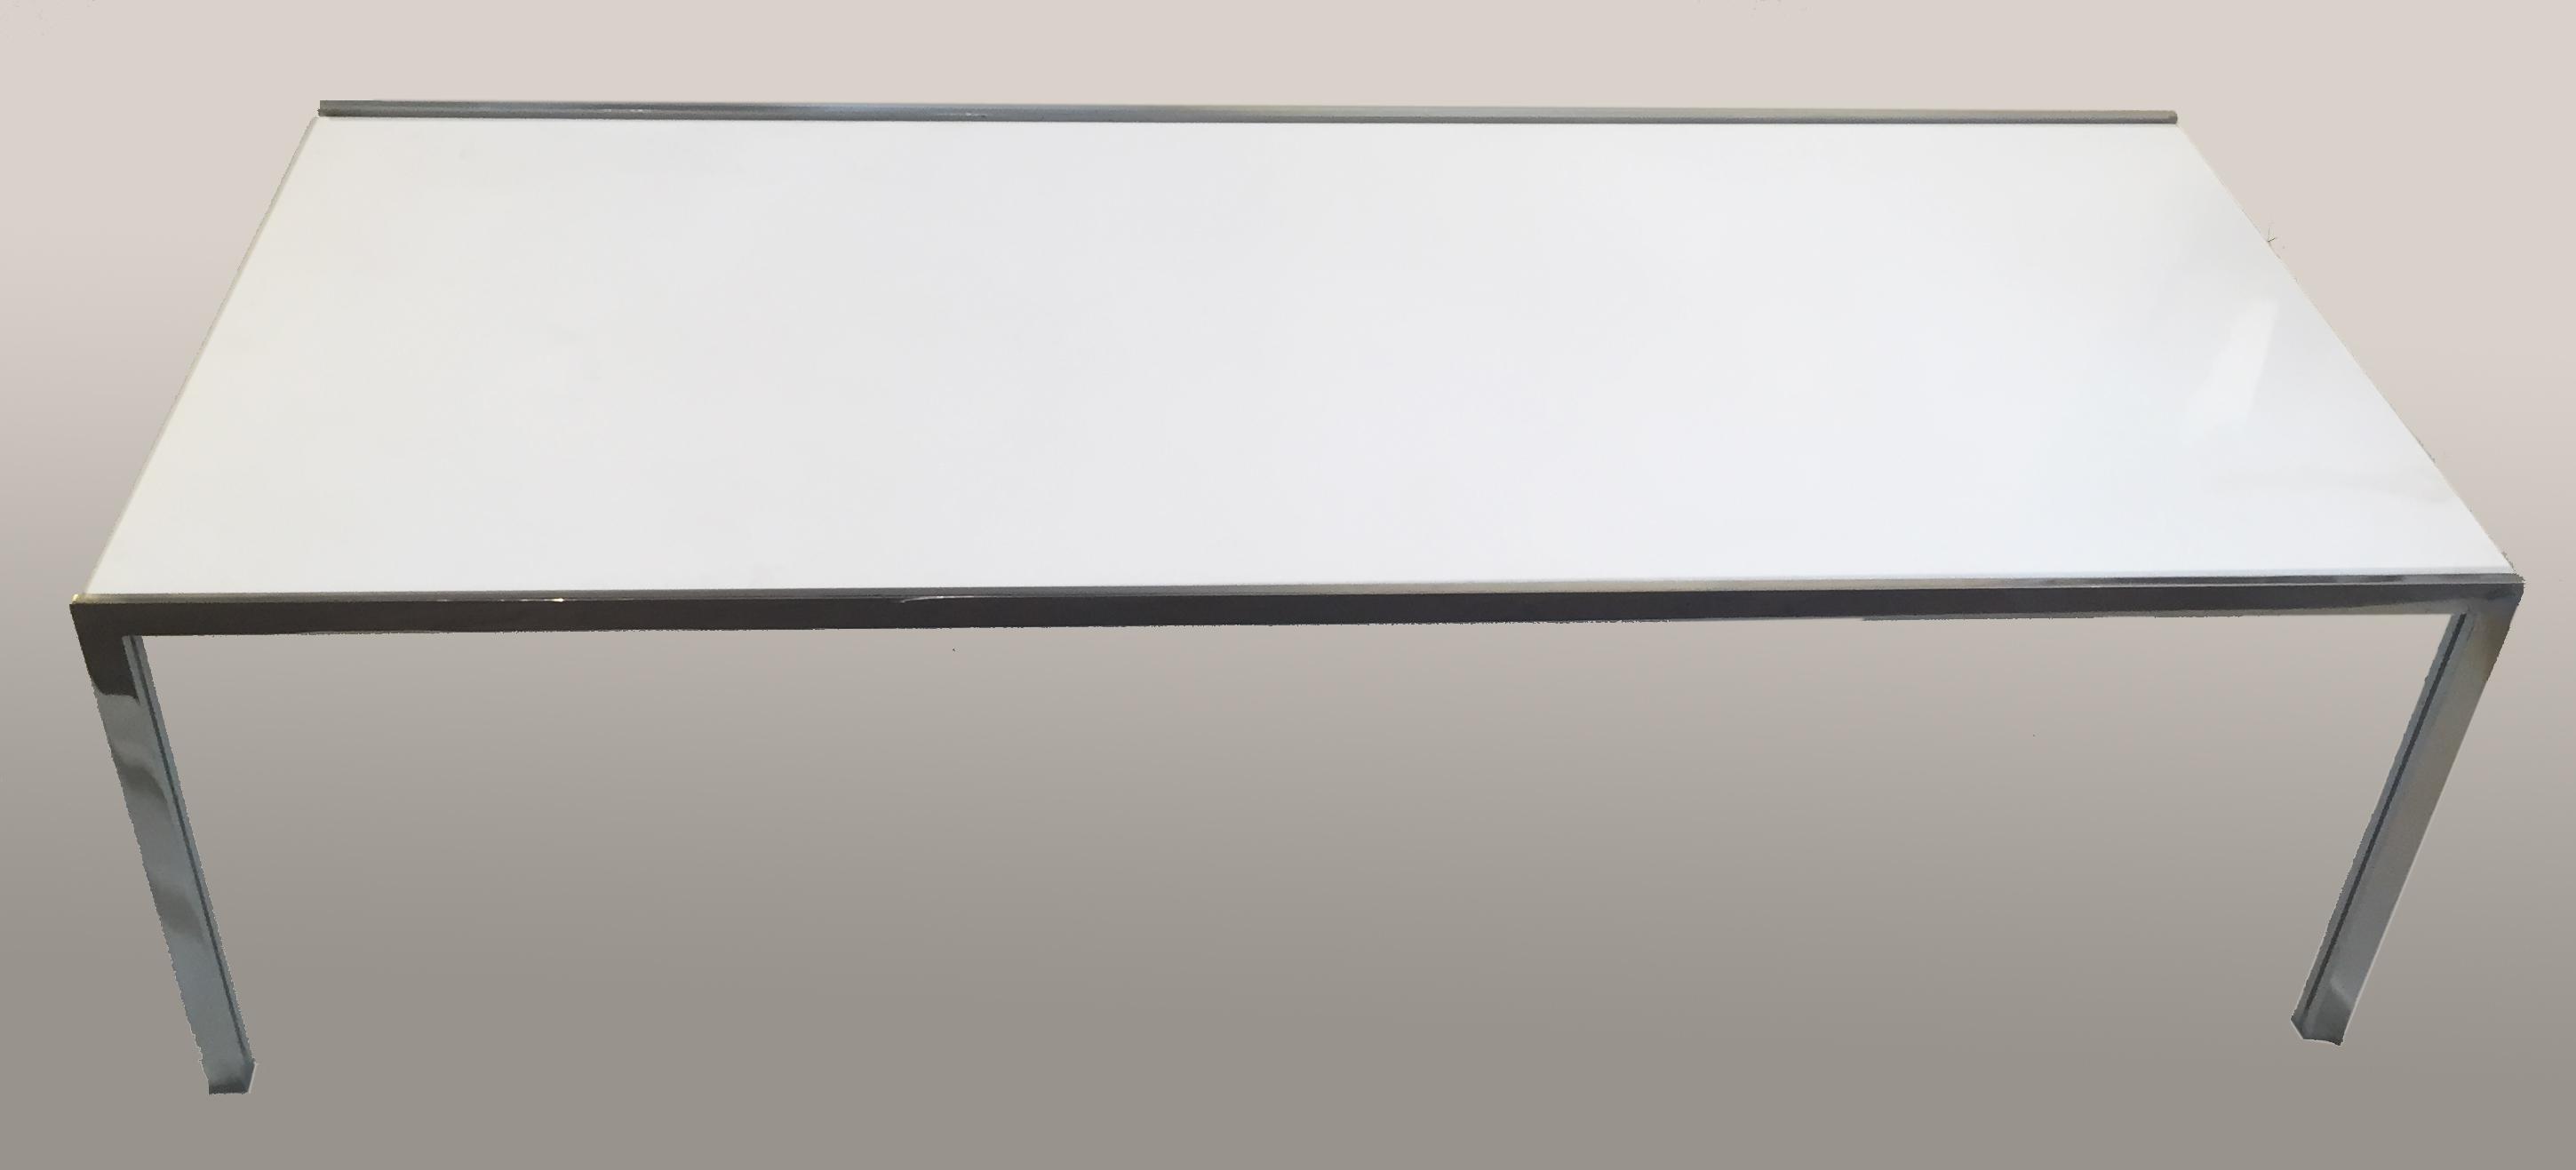 table basse knoll marbre